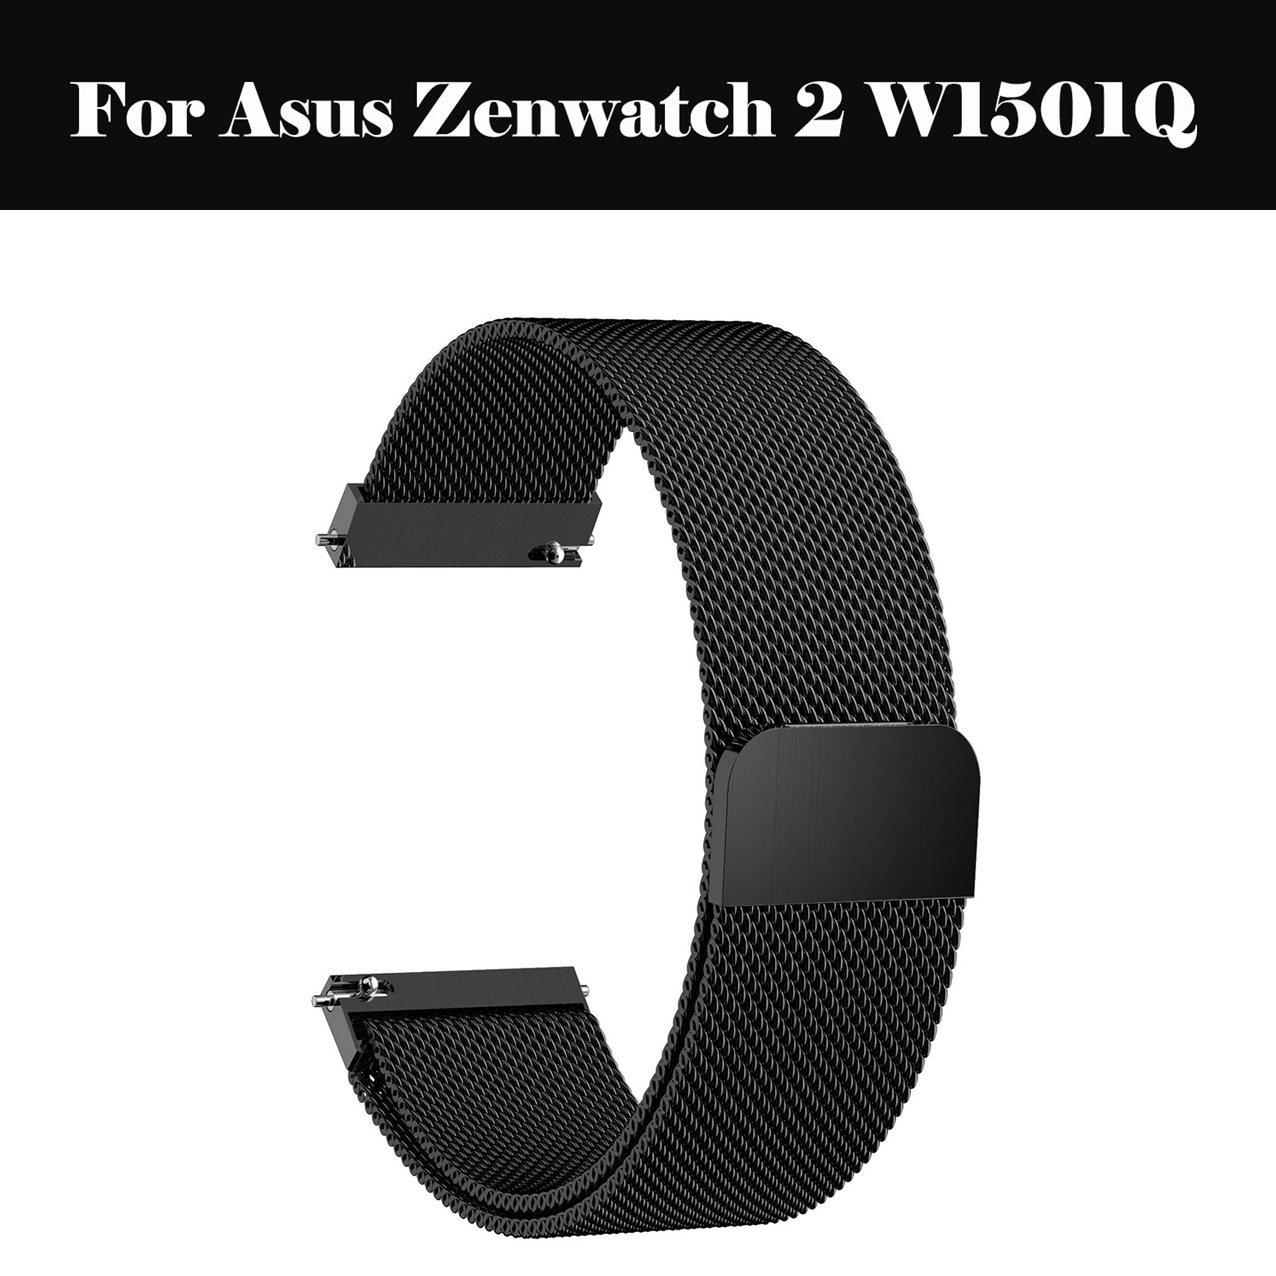 Correa de reloj 20mm 22mm 18mm 42 46mm correa Milanesa de acero inoxidable 14 16 18 24mm para Asus Zenwatch 2 W1501Q